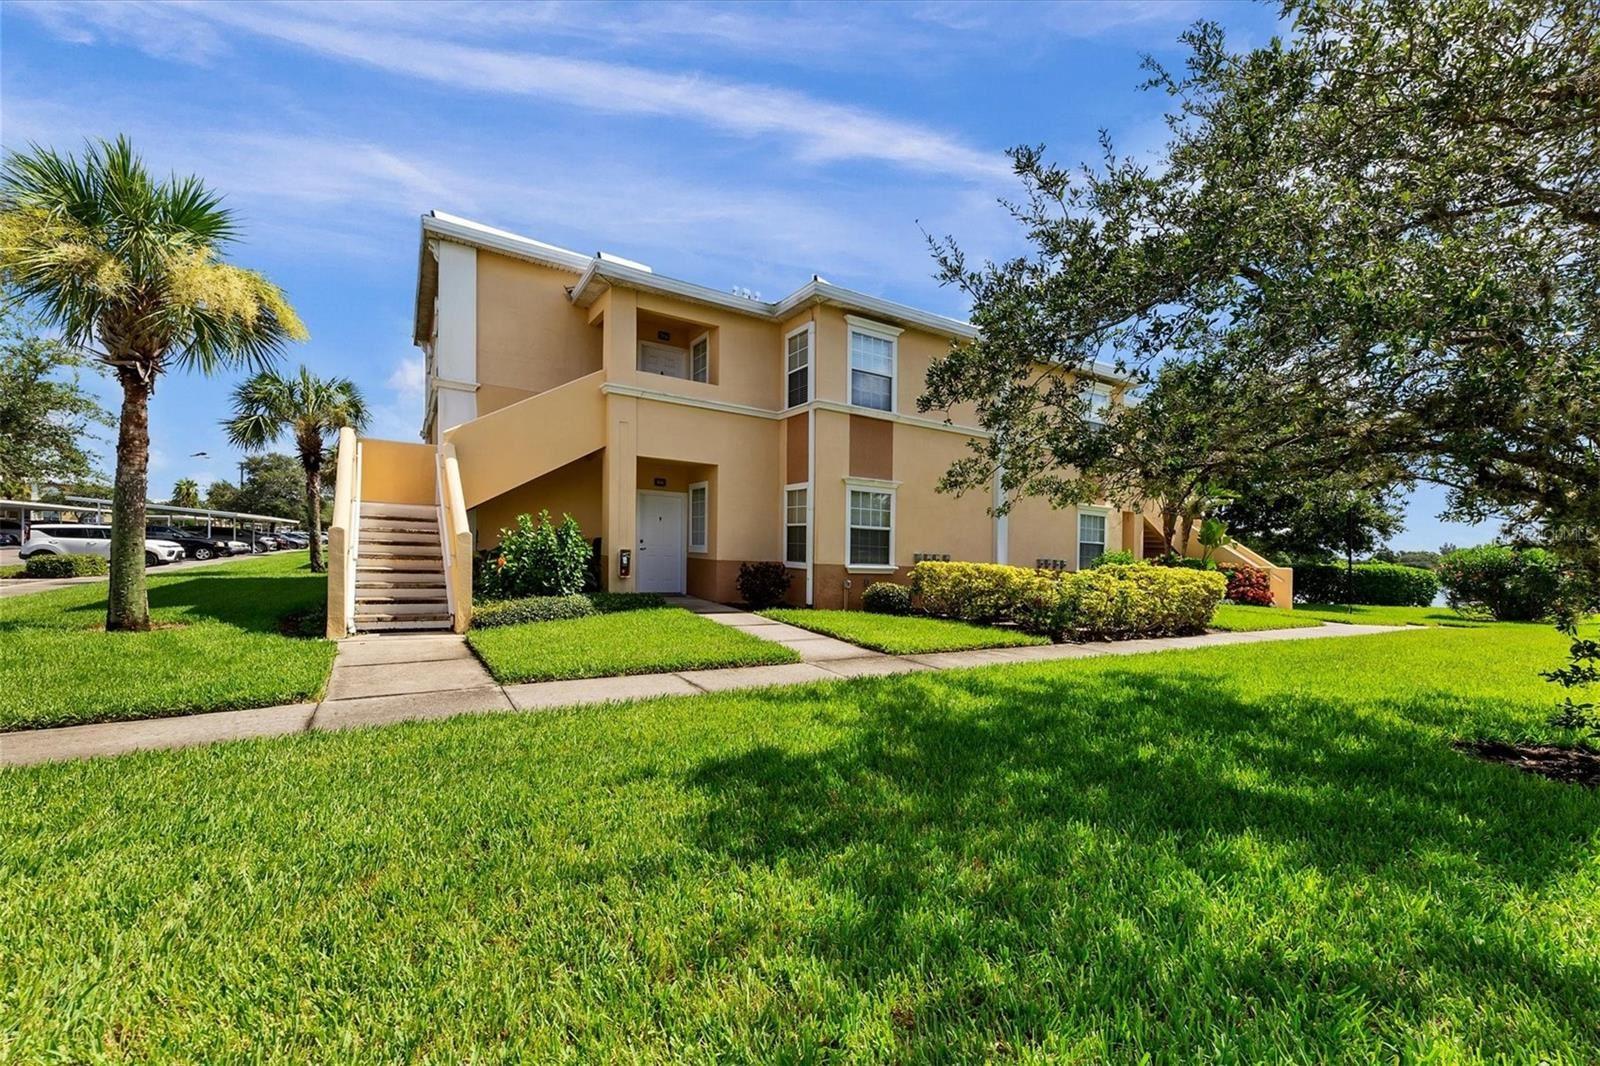 1020 VILLAGIO CIRCLE #104, Sarasota, FL 34237 - #: A4509352